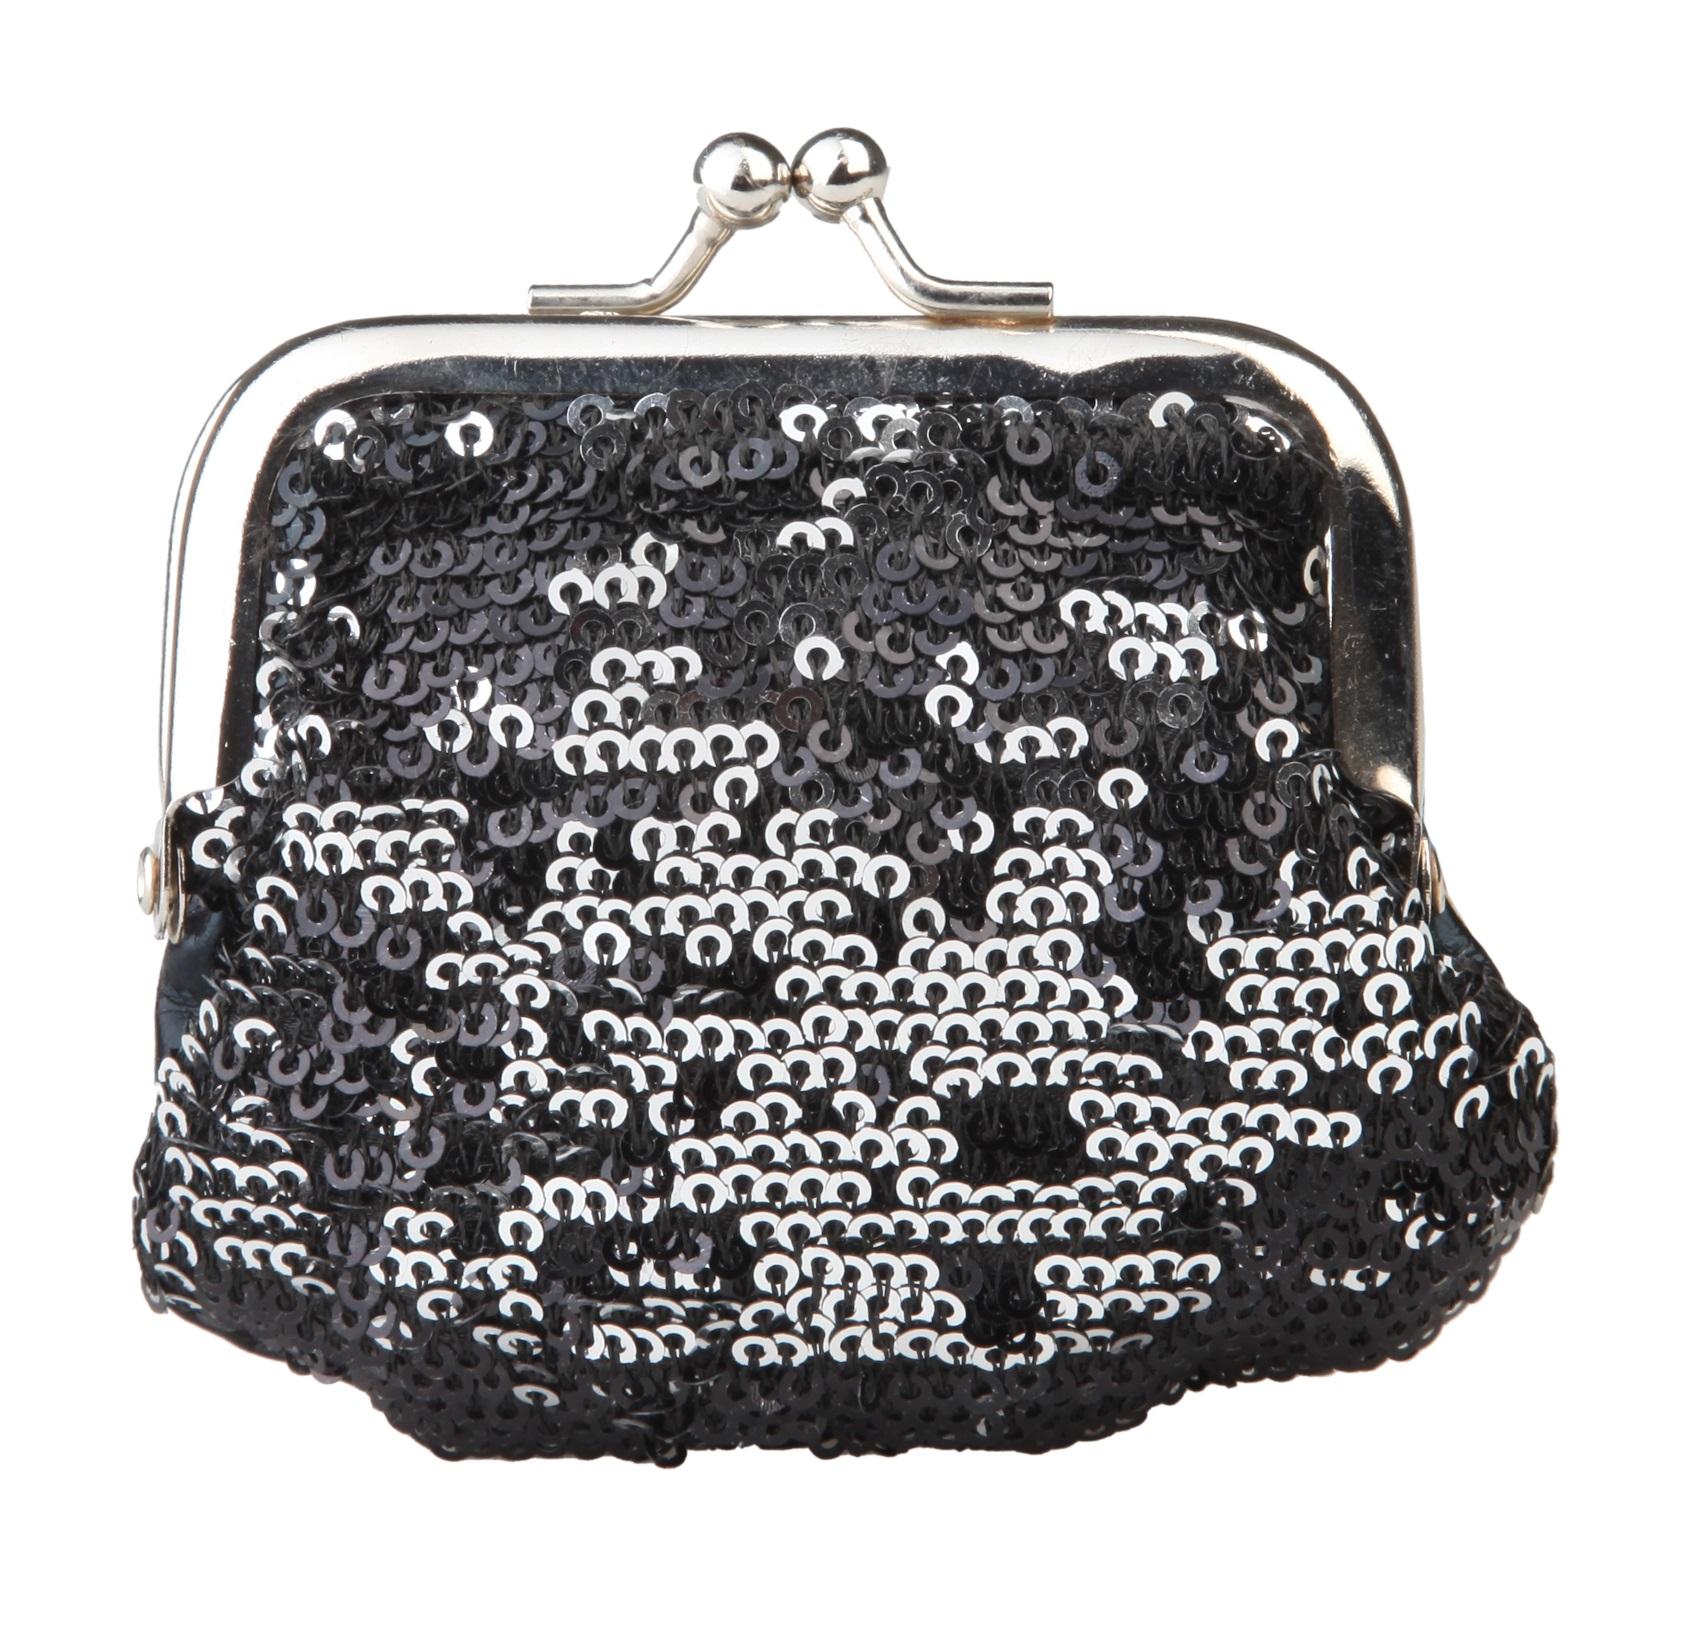 Segue Wallet Black Rf600108